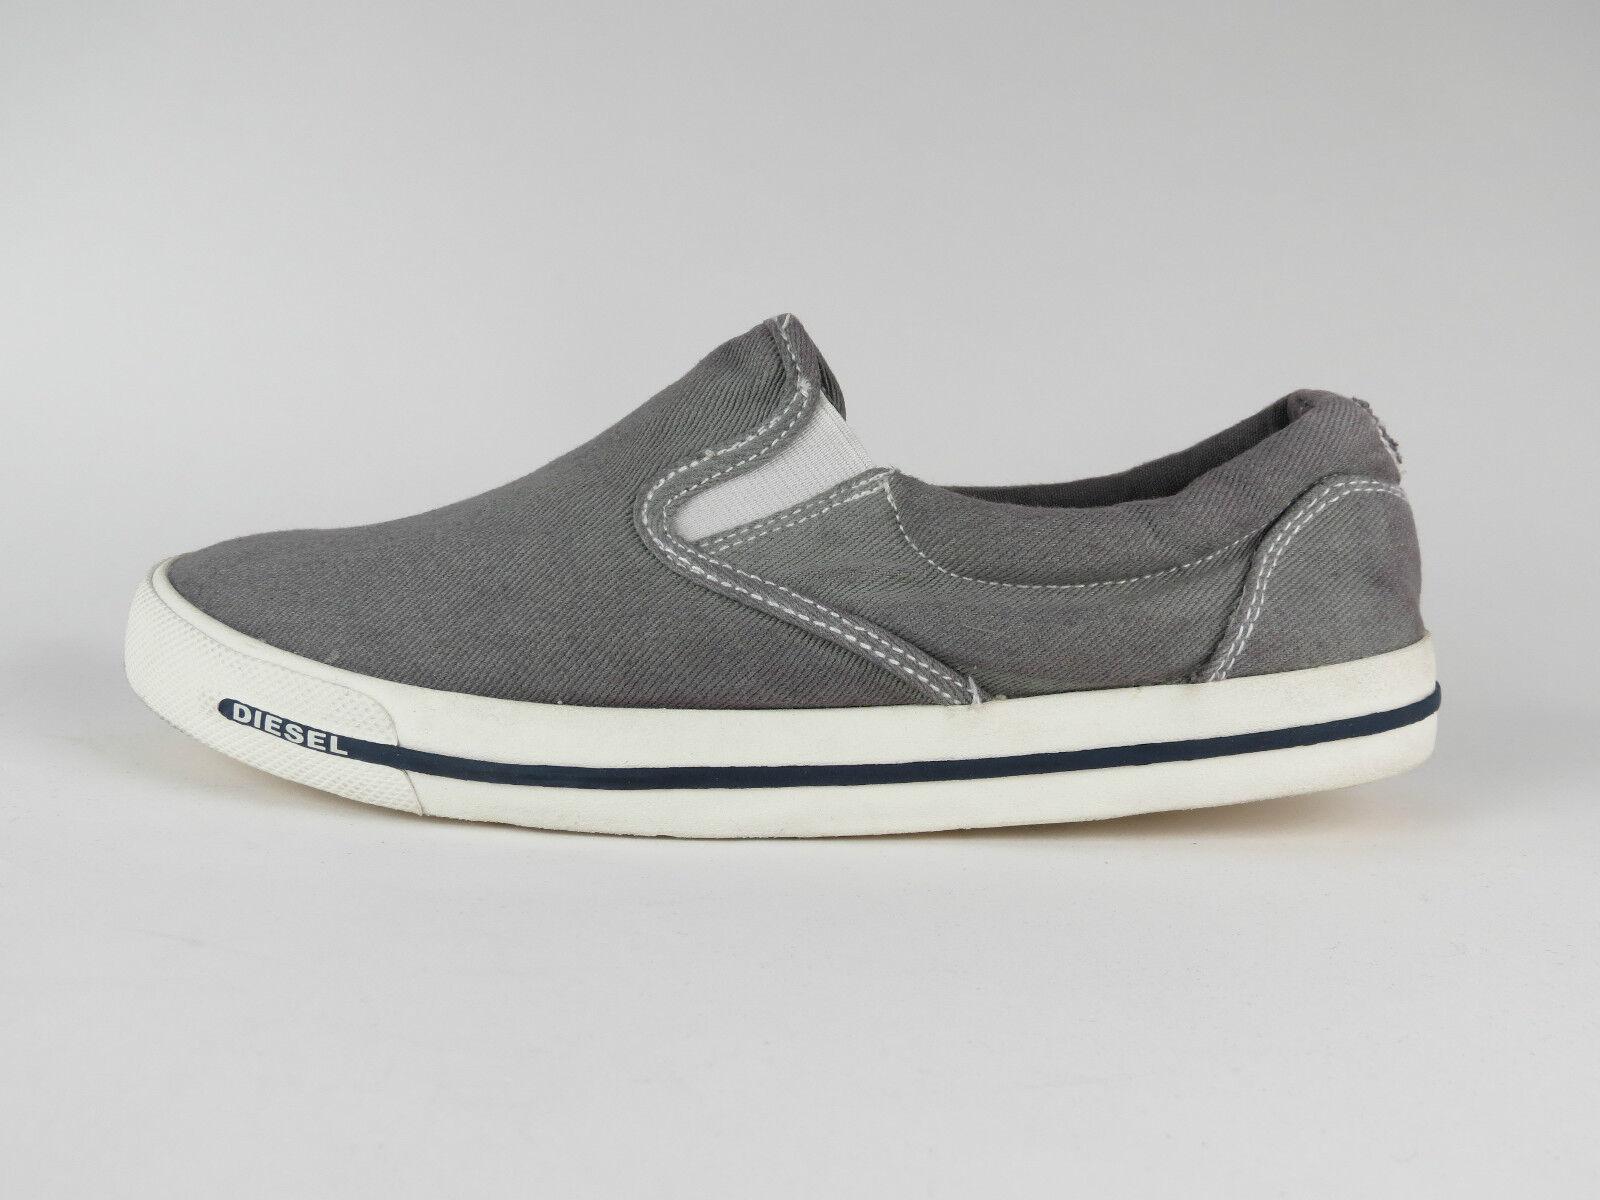 Diesel Sneaker Men SUB-WAYS grau grey Y01049 PR163 T8081 +NEU+ Größe 40 - 44